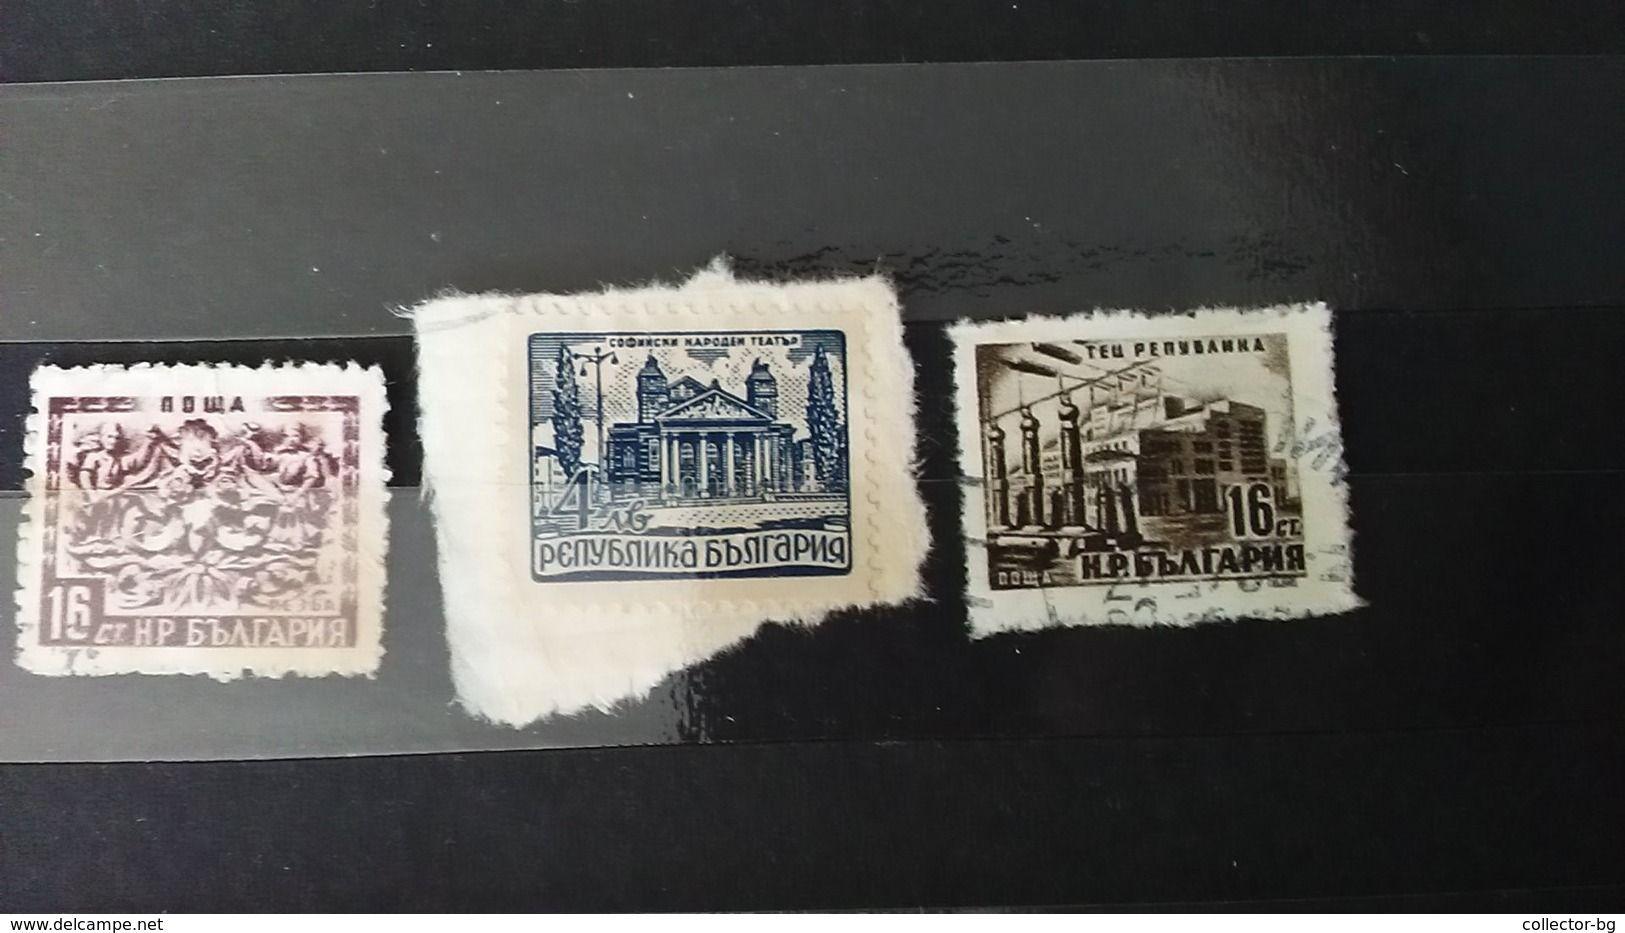 Pin on ultra rare vintage stamp